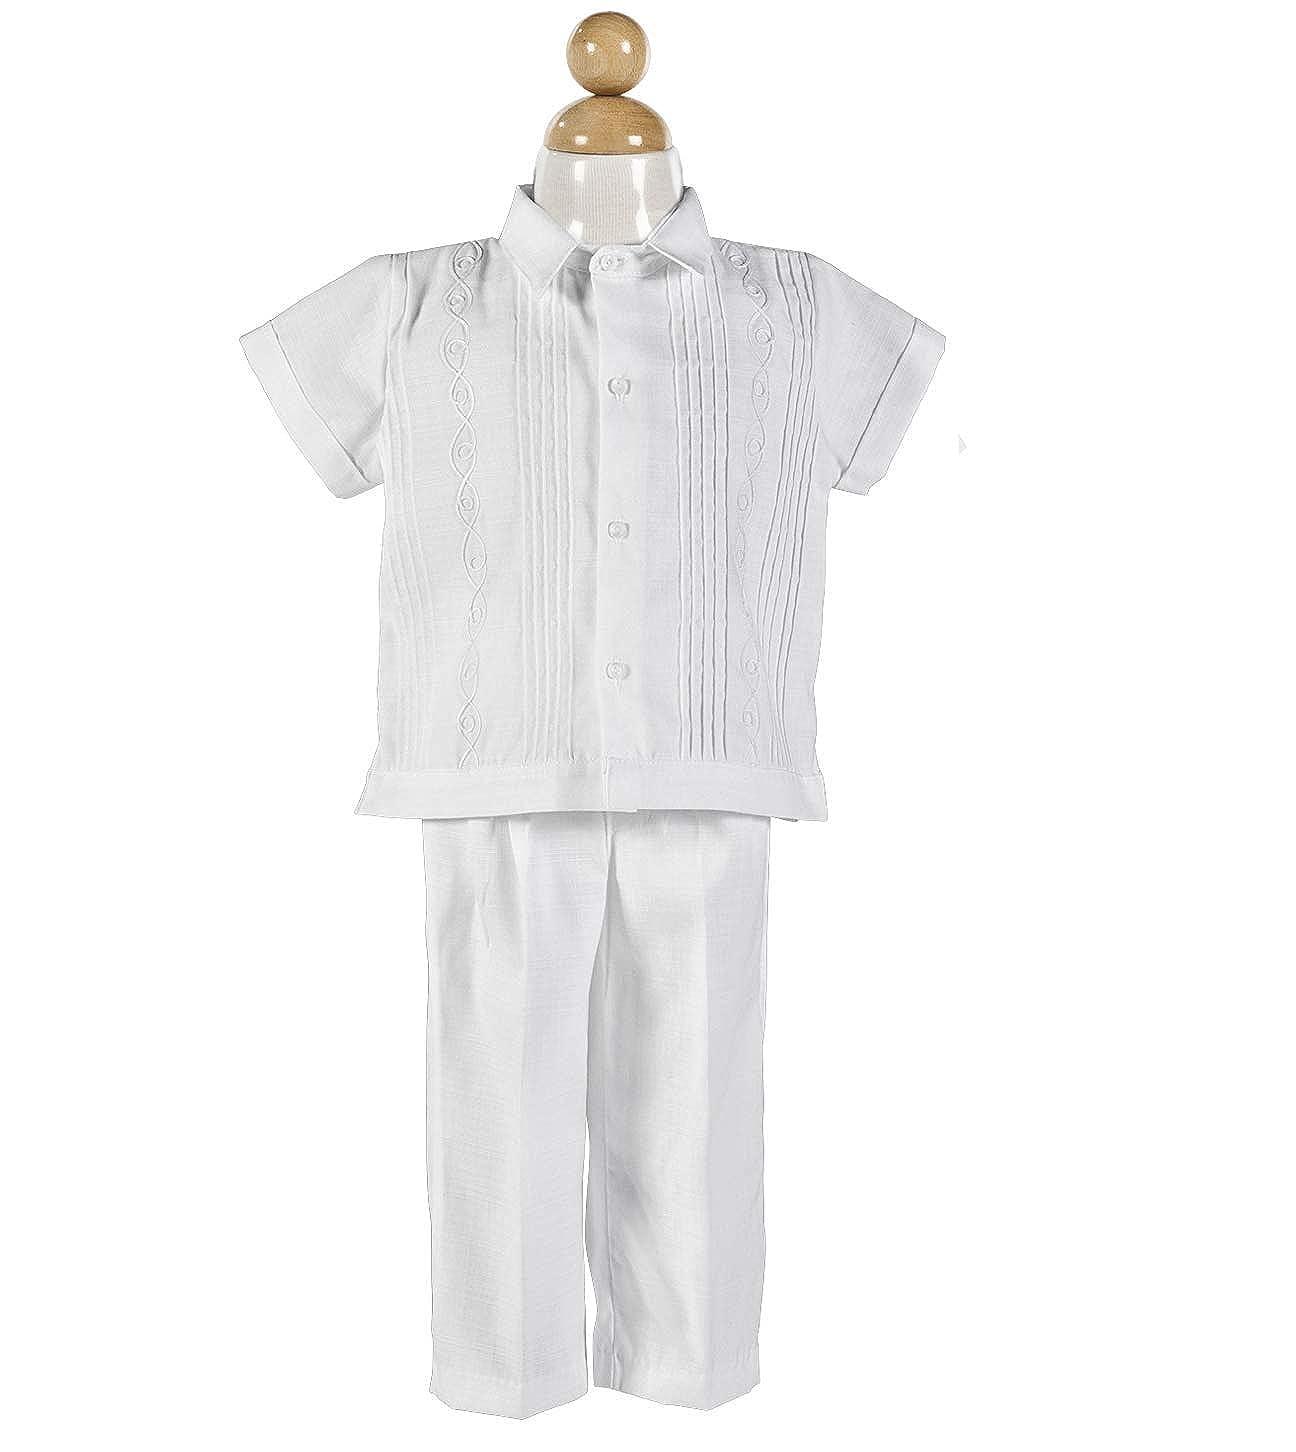 Amazon.com: Boys Baptism/Christening Outfit, Traje De ...